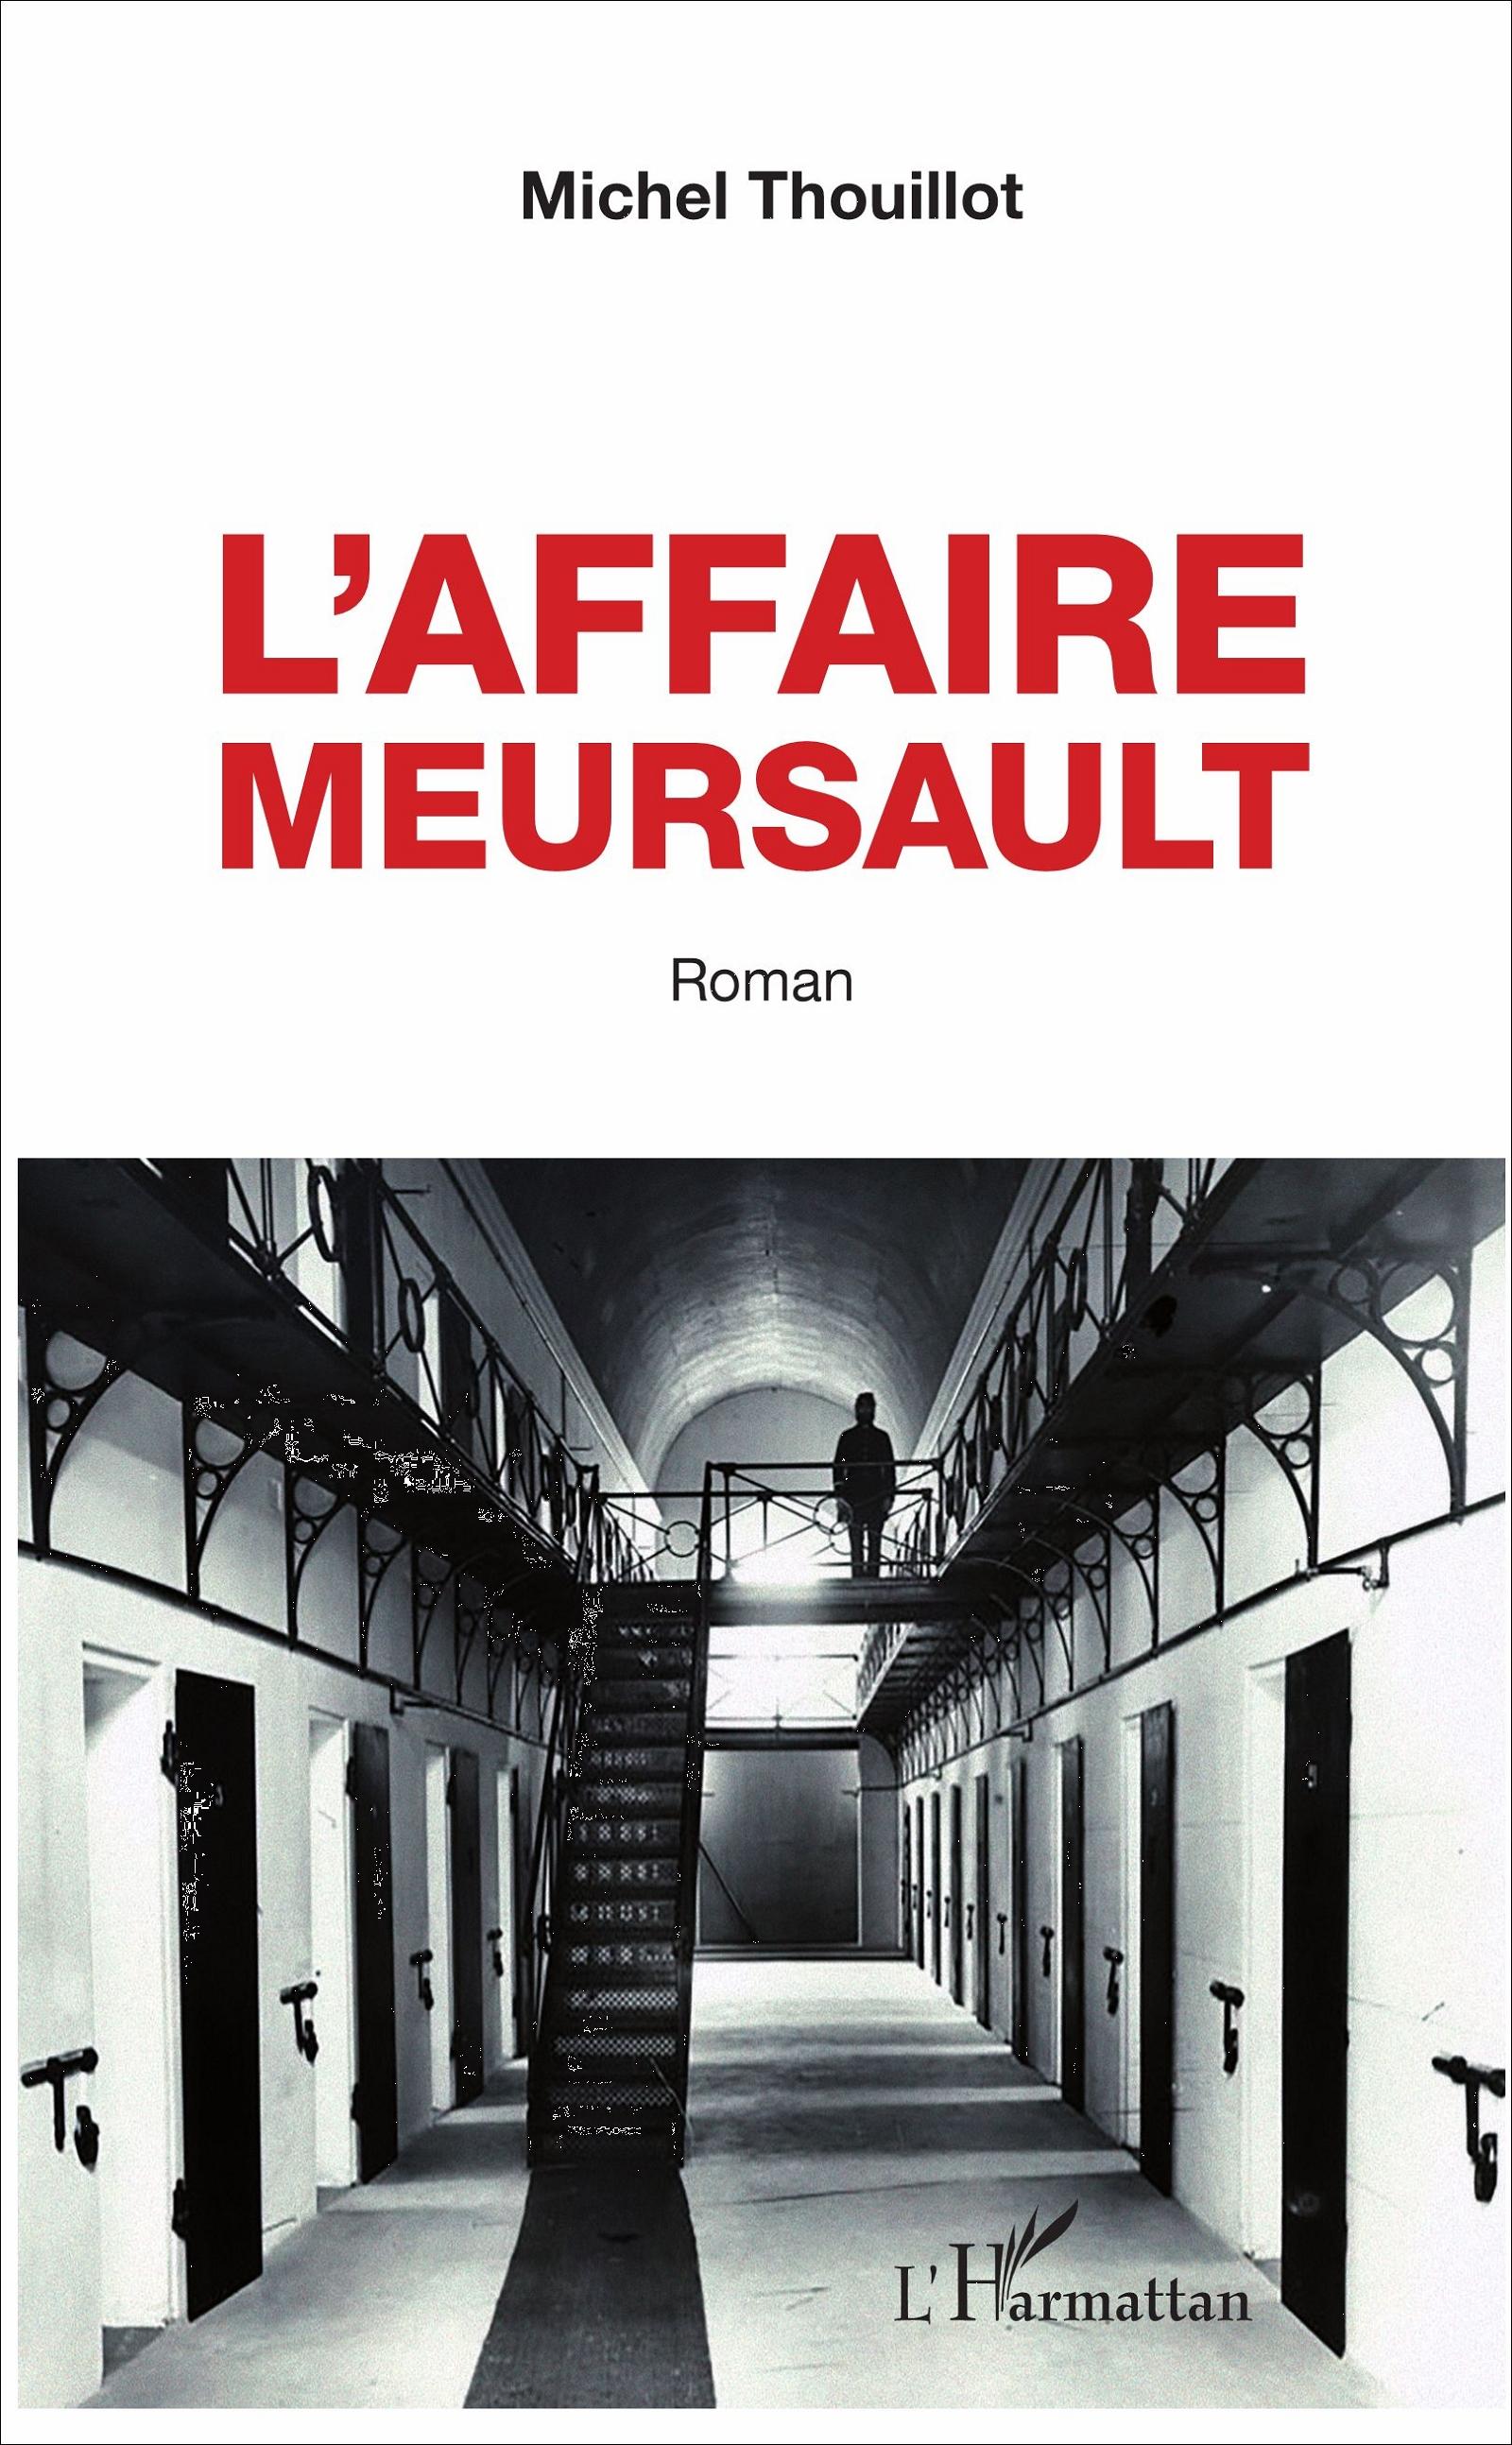 32b21acbbc68c L'AFFAIRE MEURSAULT - Roman, Michel Thouillot - livre, ebook, epub